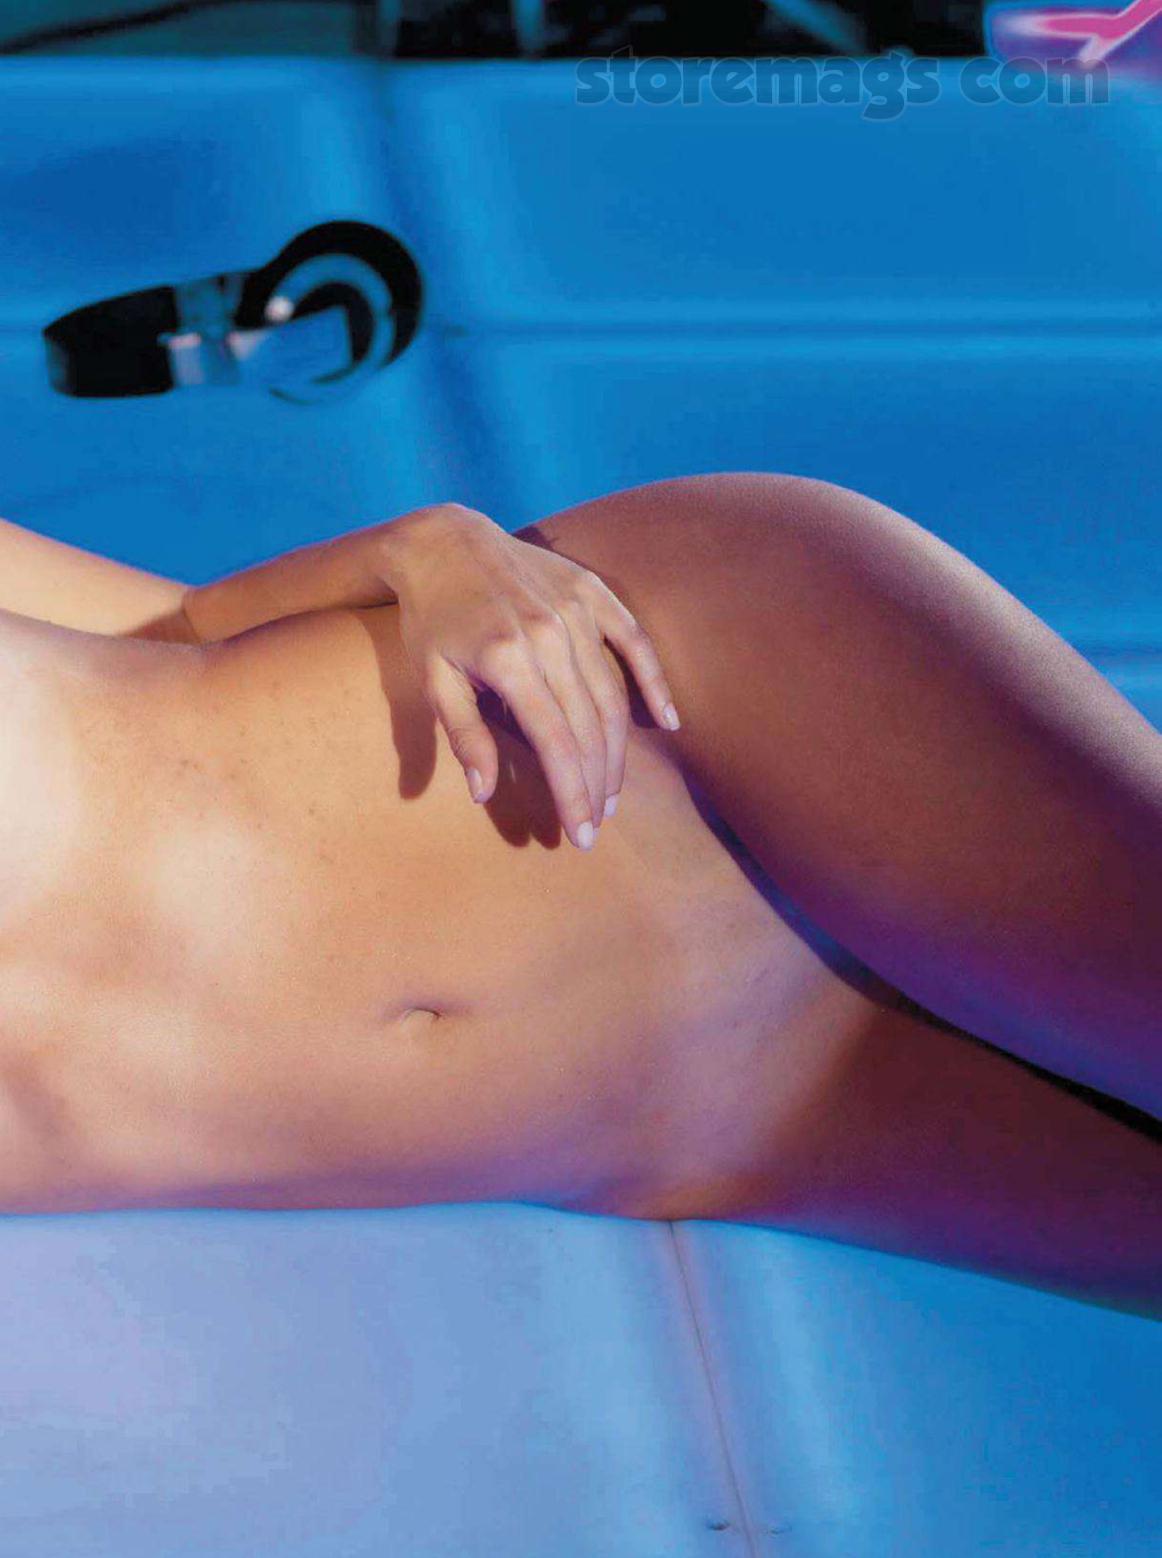 36691_septimiu29_DJAgniezka_PlayboyVenezuela_Sept20129_123_518lo.jpg